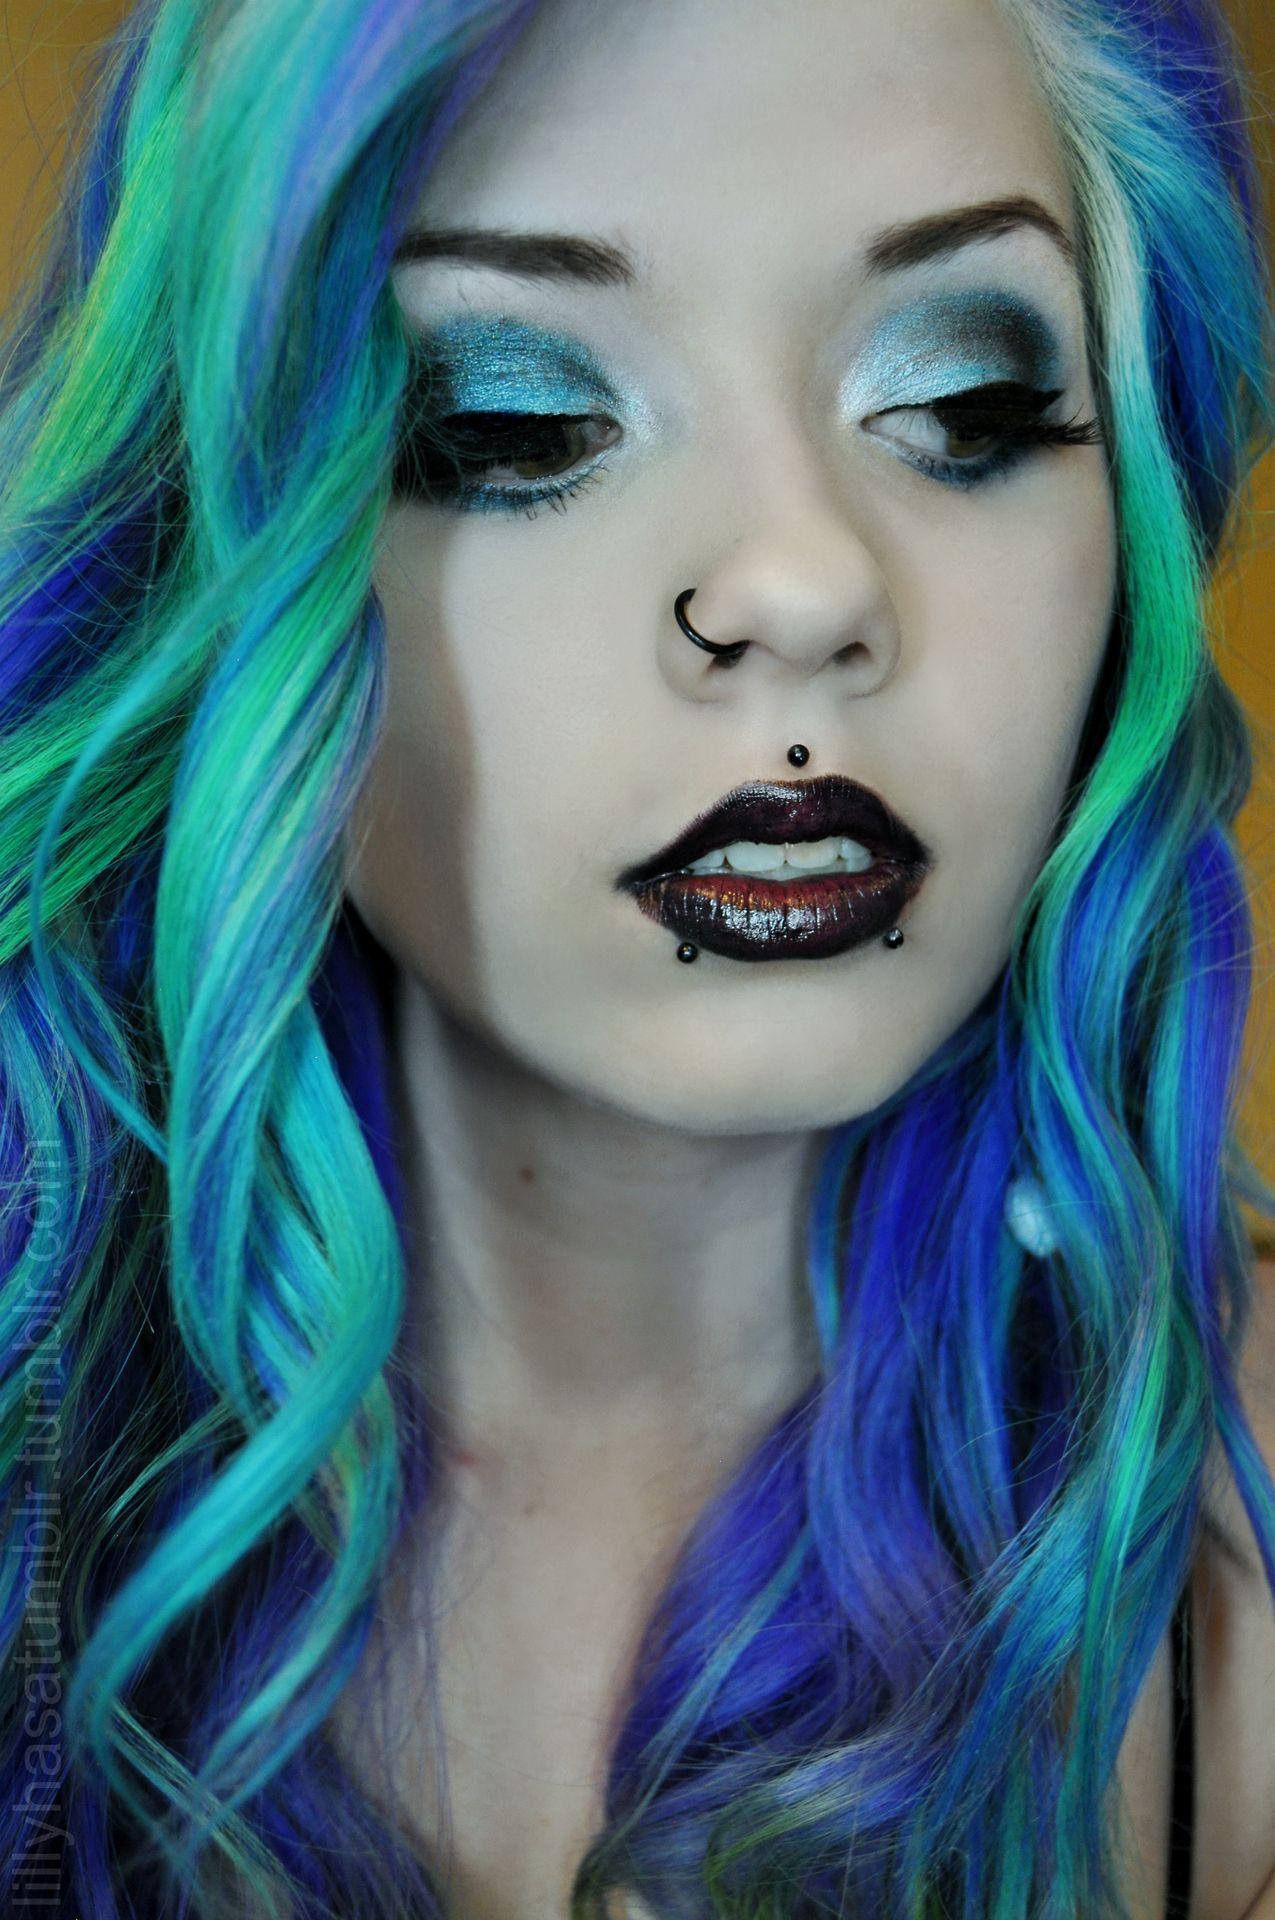 Bluehairgreenhairturquoisehair hair pinterest her hair